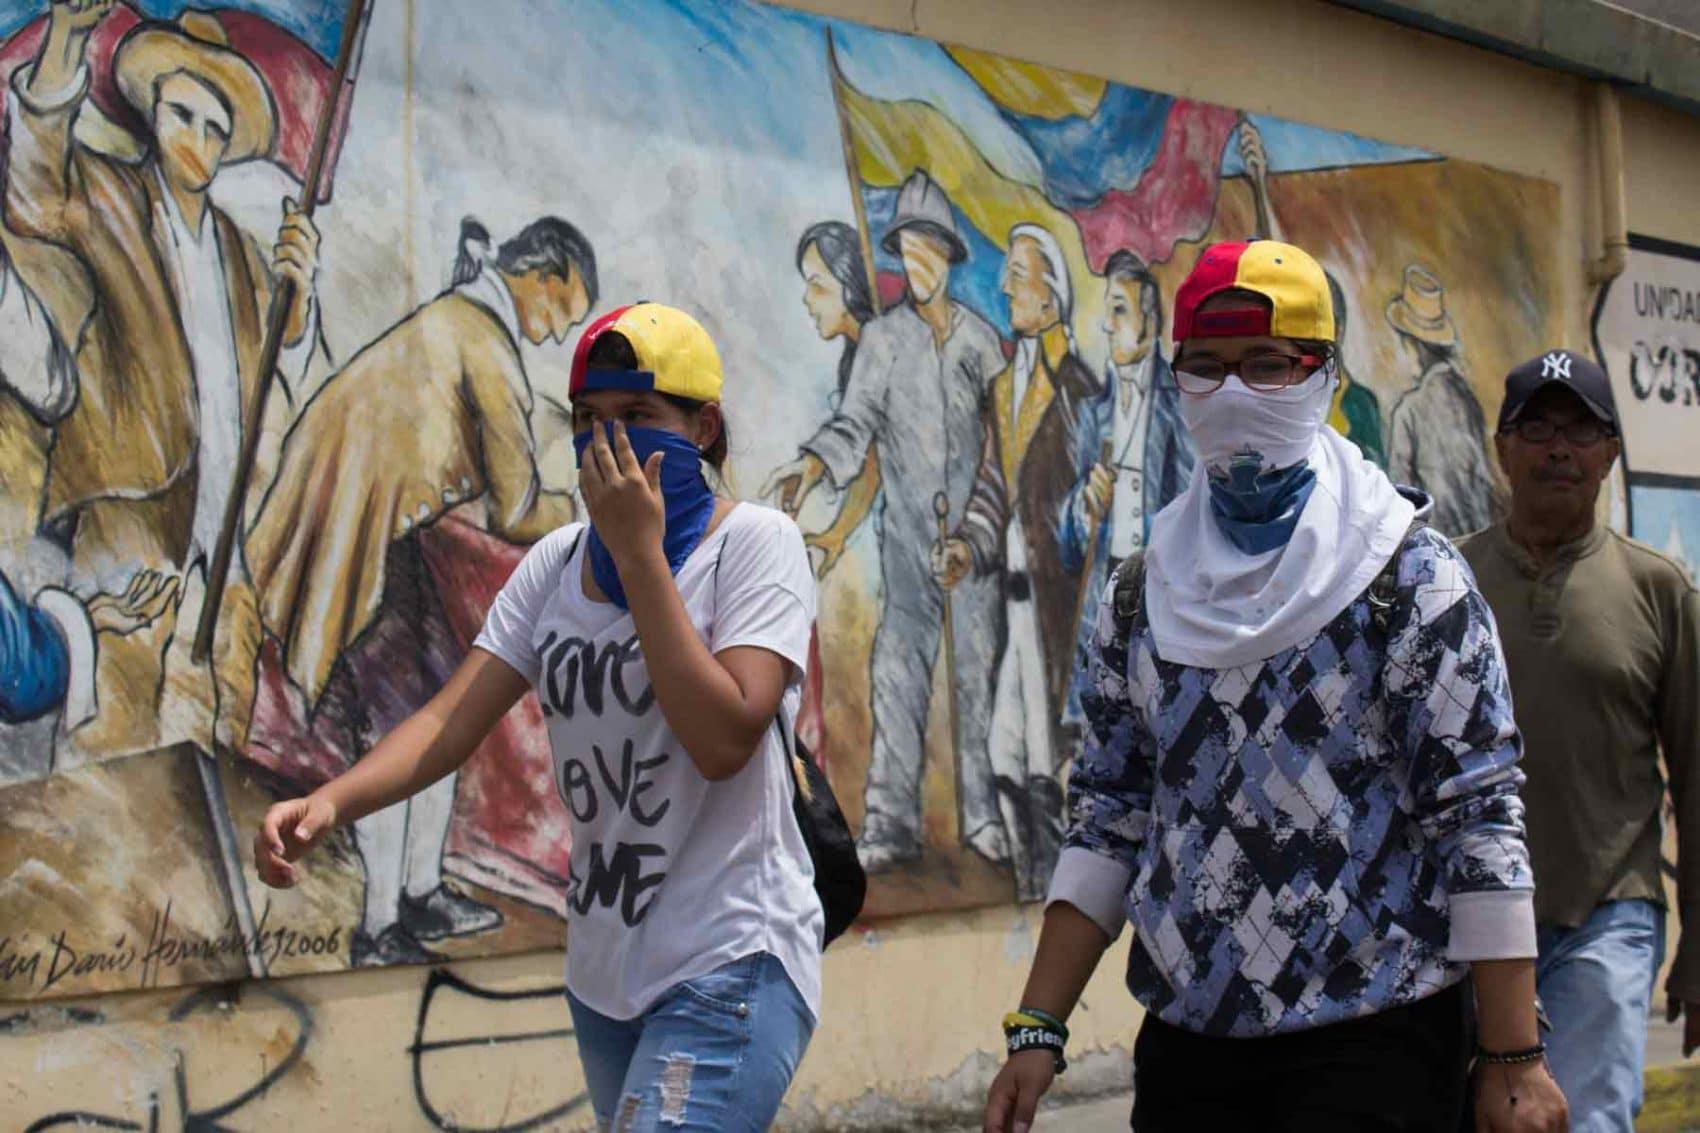 Conflict for freelance documentary photographer Sebastian Astorga